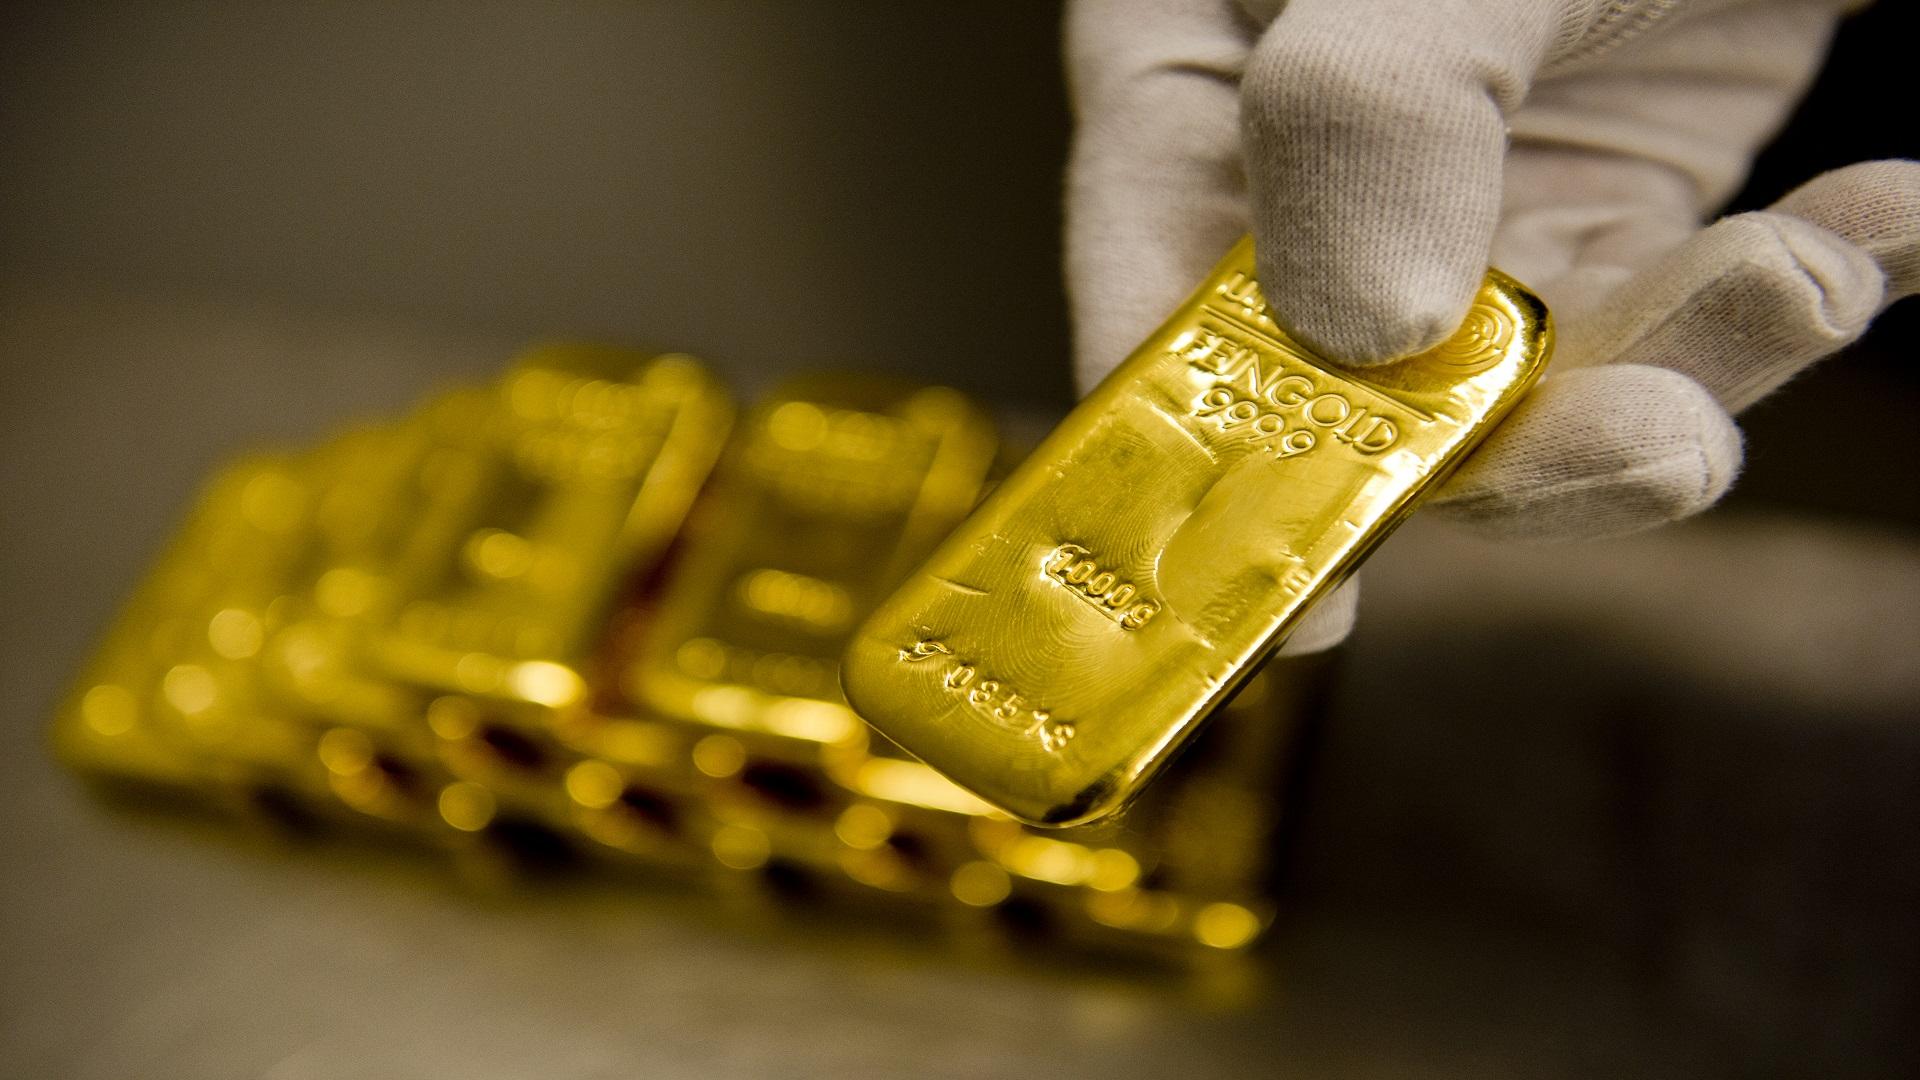 slitki - Saxo Bank: прорыв золота не состоялся, но тренд в силе